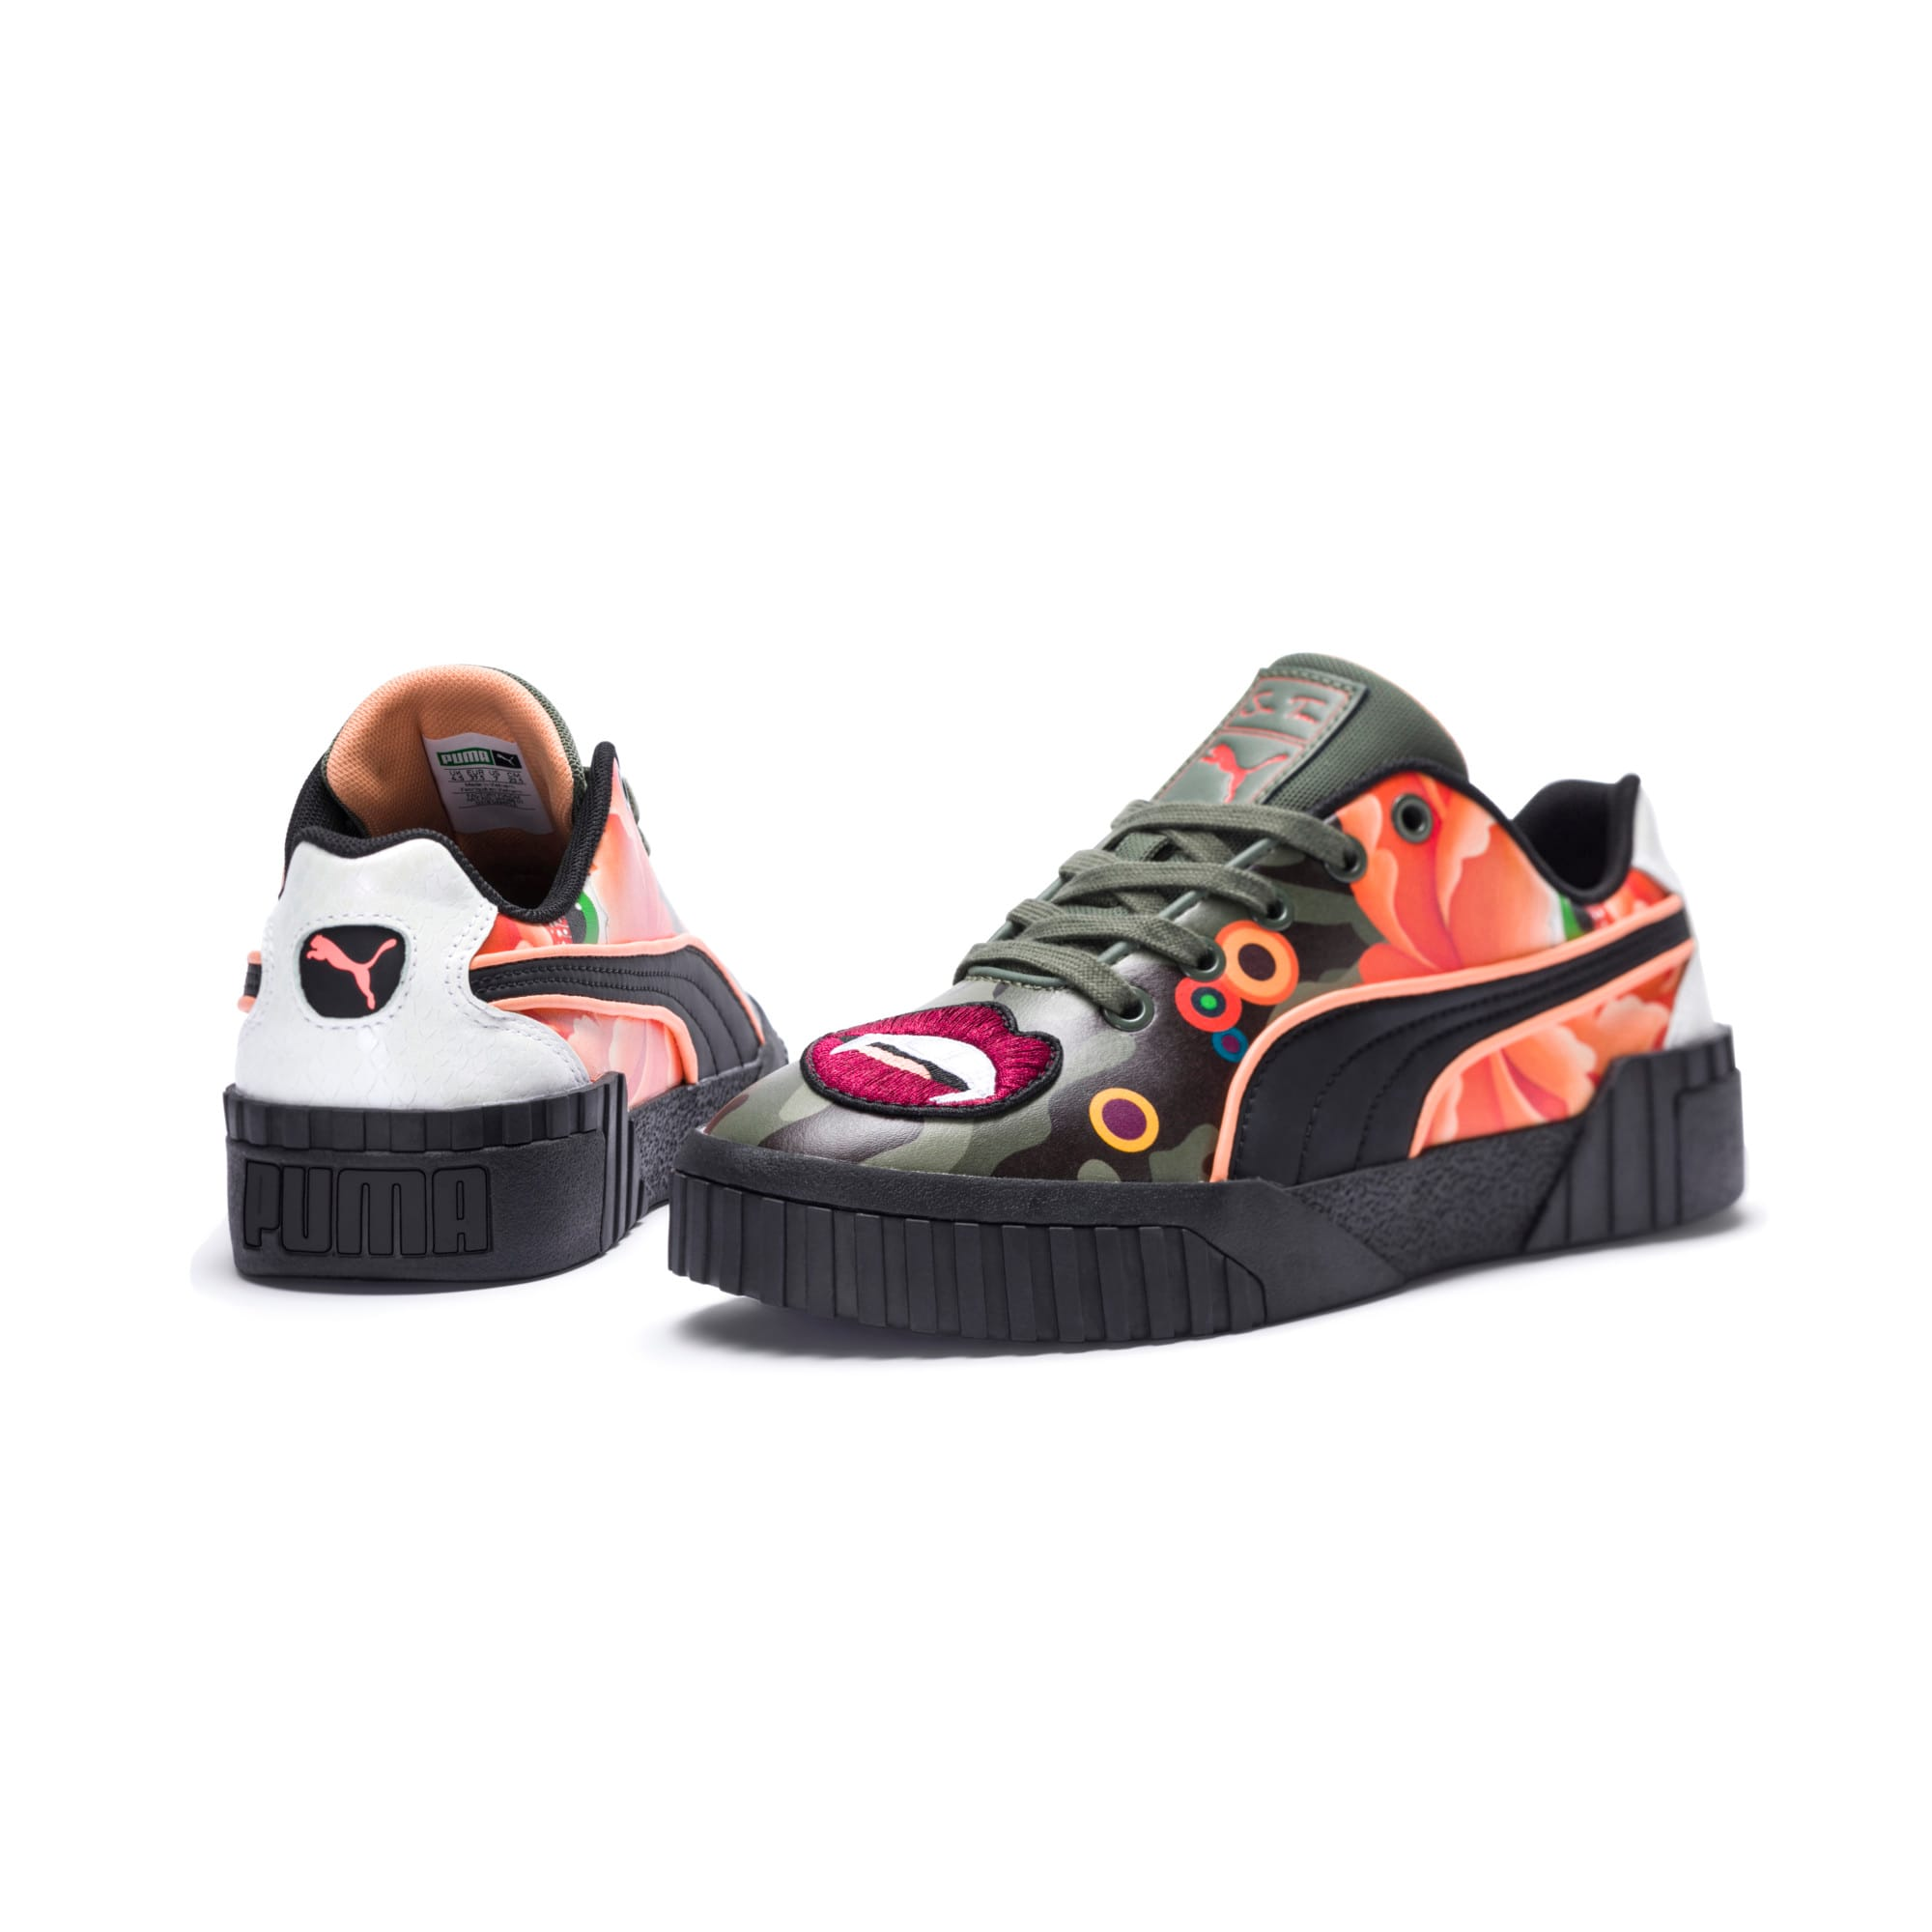 Thumbnail 9 of PUMA x SUE TSAI Cali Peonies Camo Women's Sneakers, Puma Black-Puma Black, medium